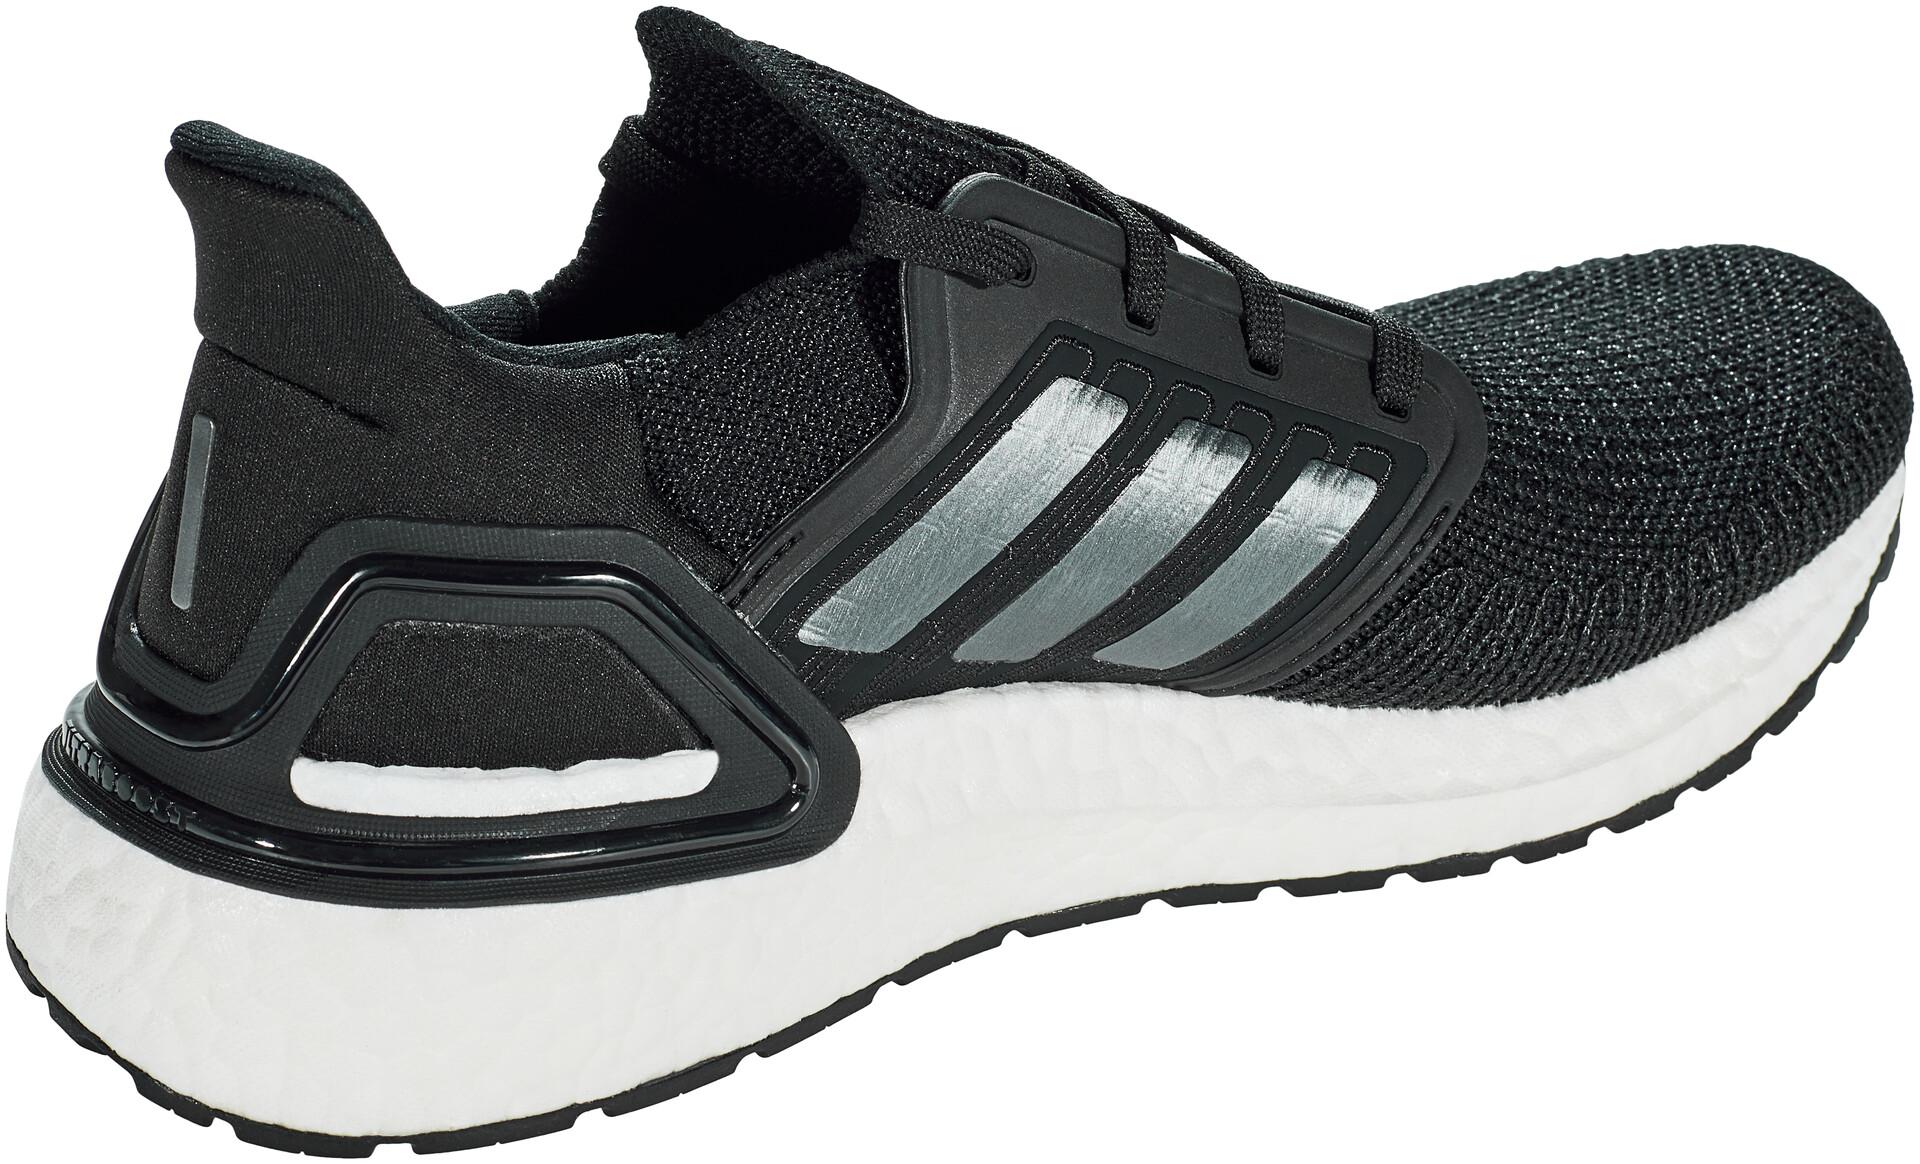 PRICE DROP! Adidas ultraBoost, continental Depop